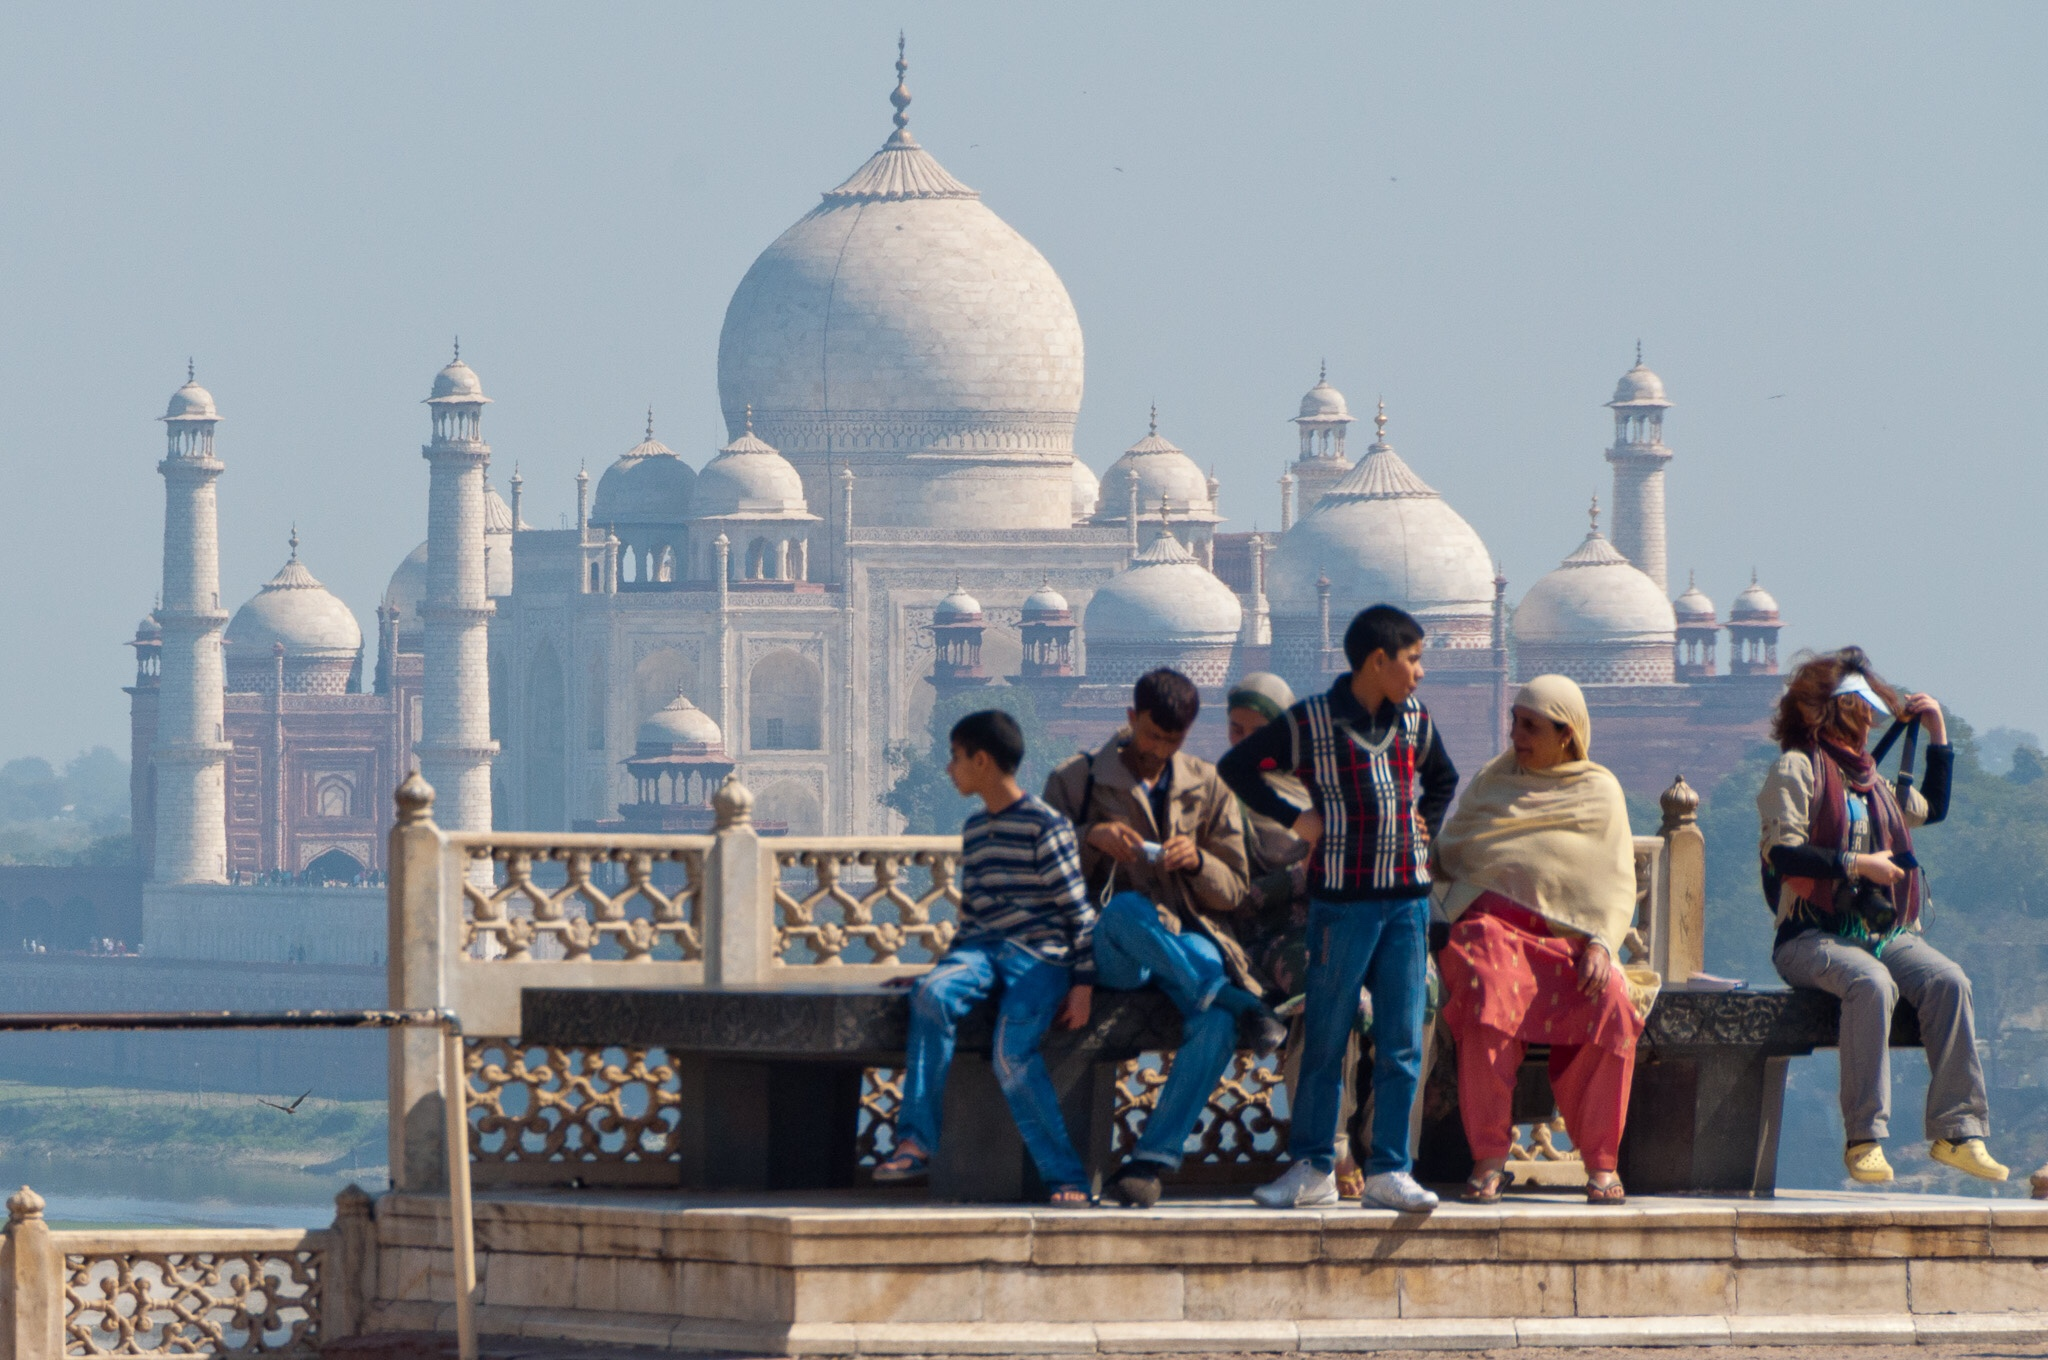 Agra, India, 2011